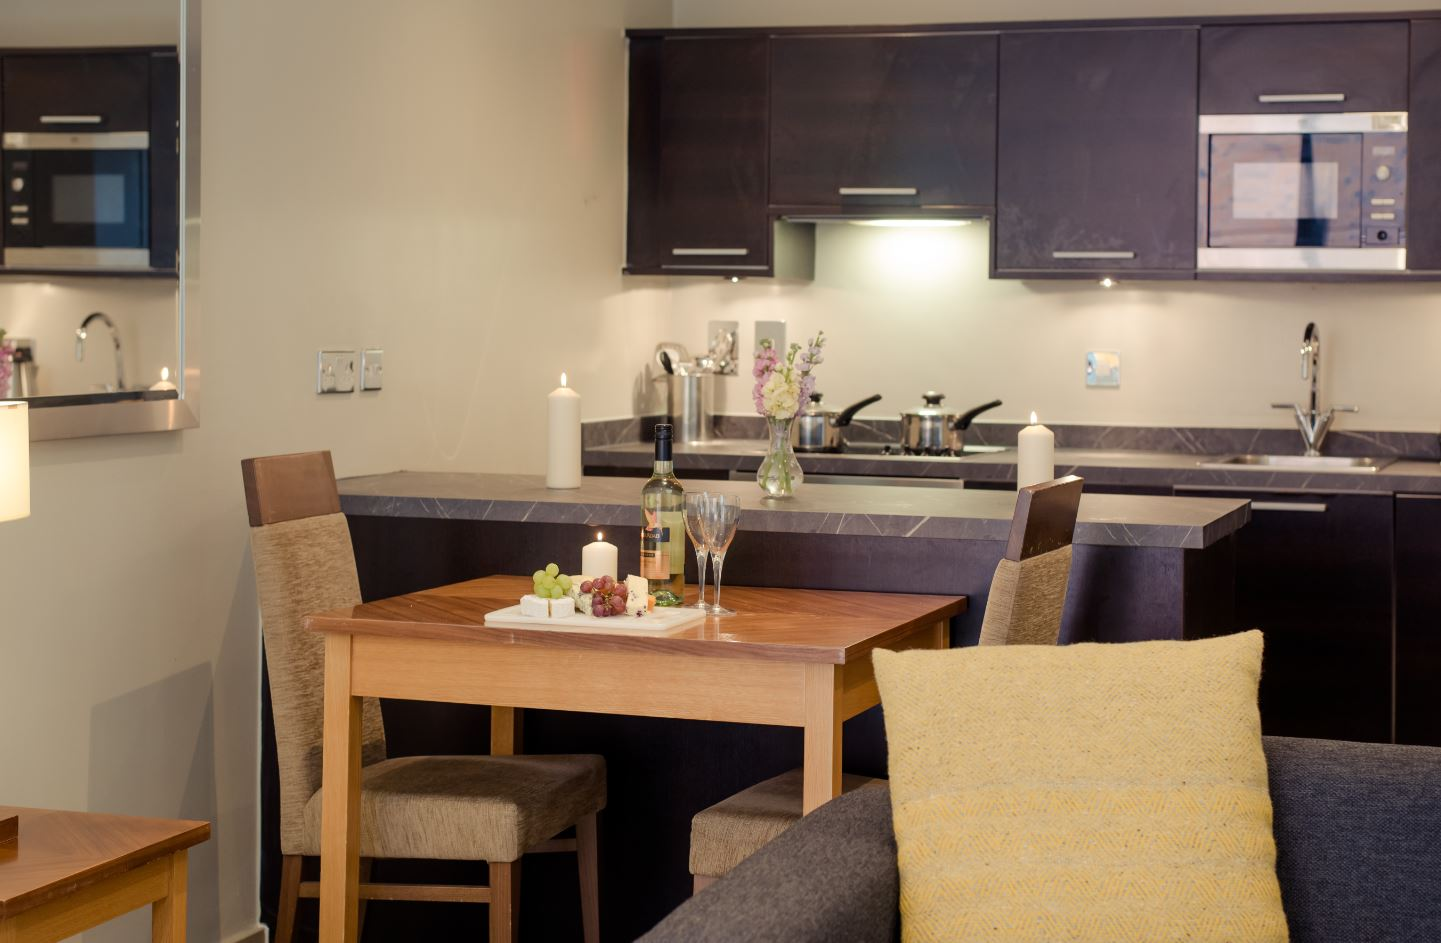 Kitchen area at Premier Suites Manchester - Citybase Apartments